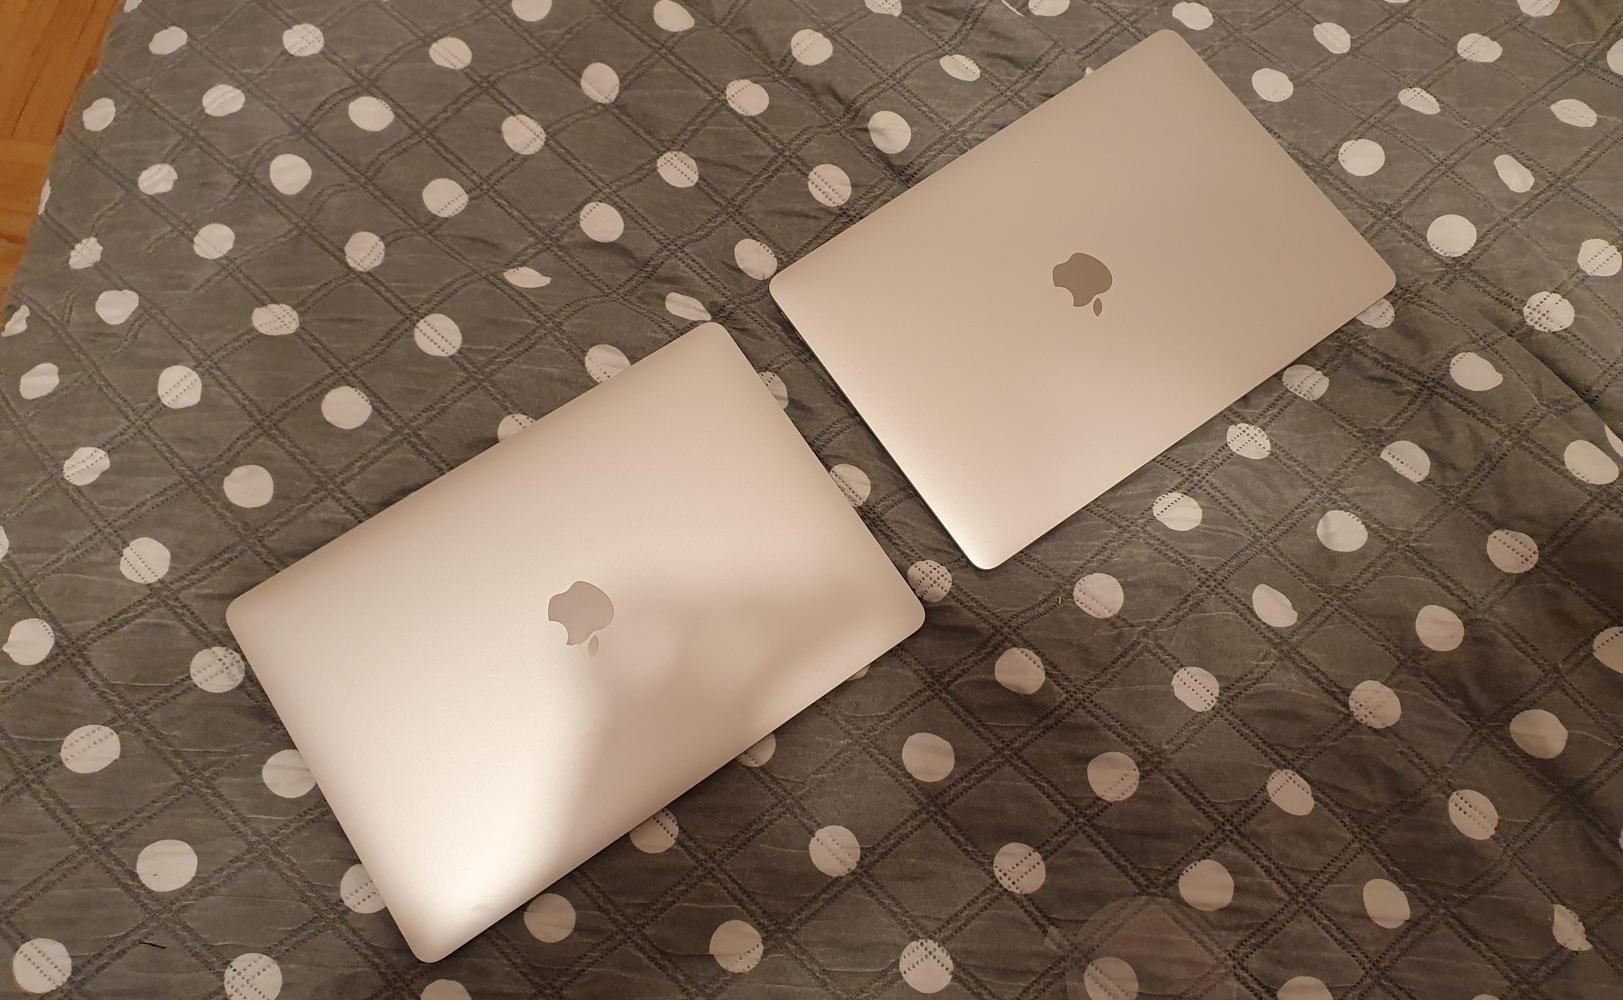 MacBook Pro 2020 M1